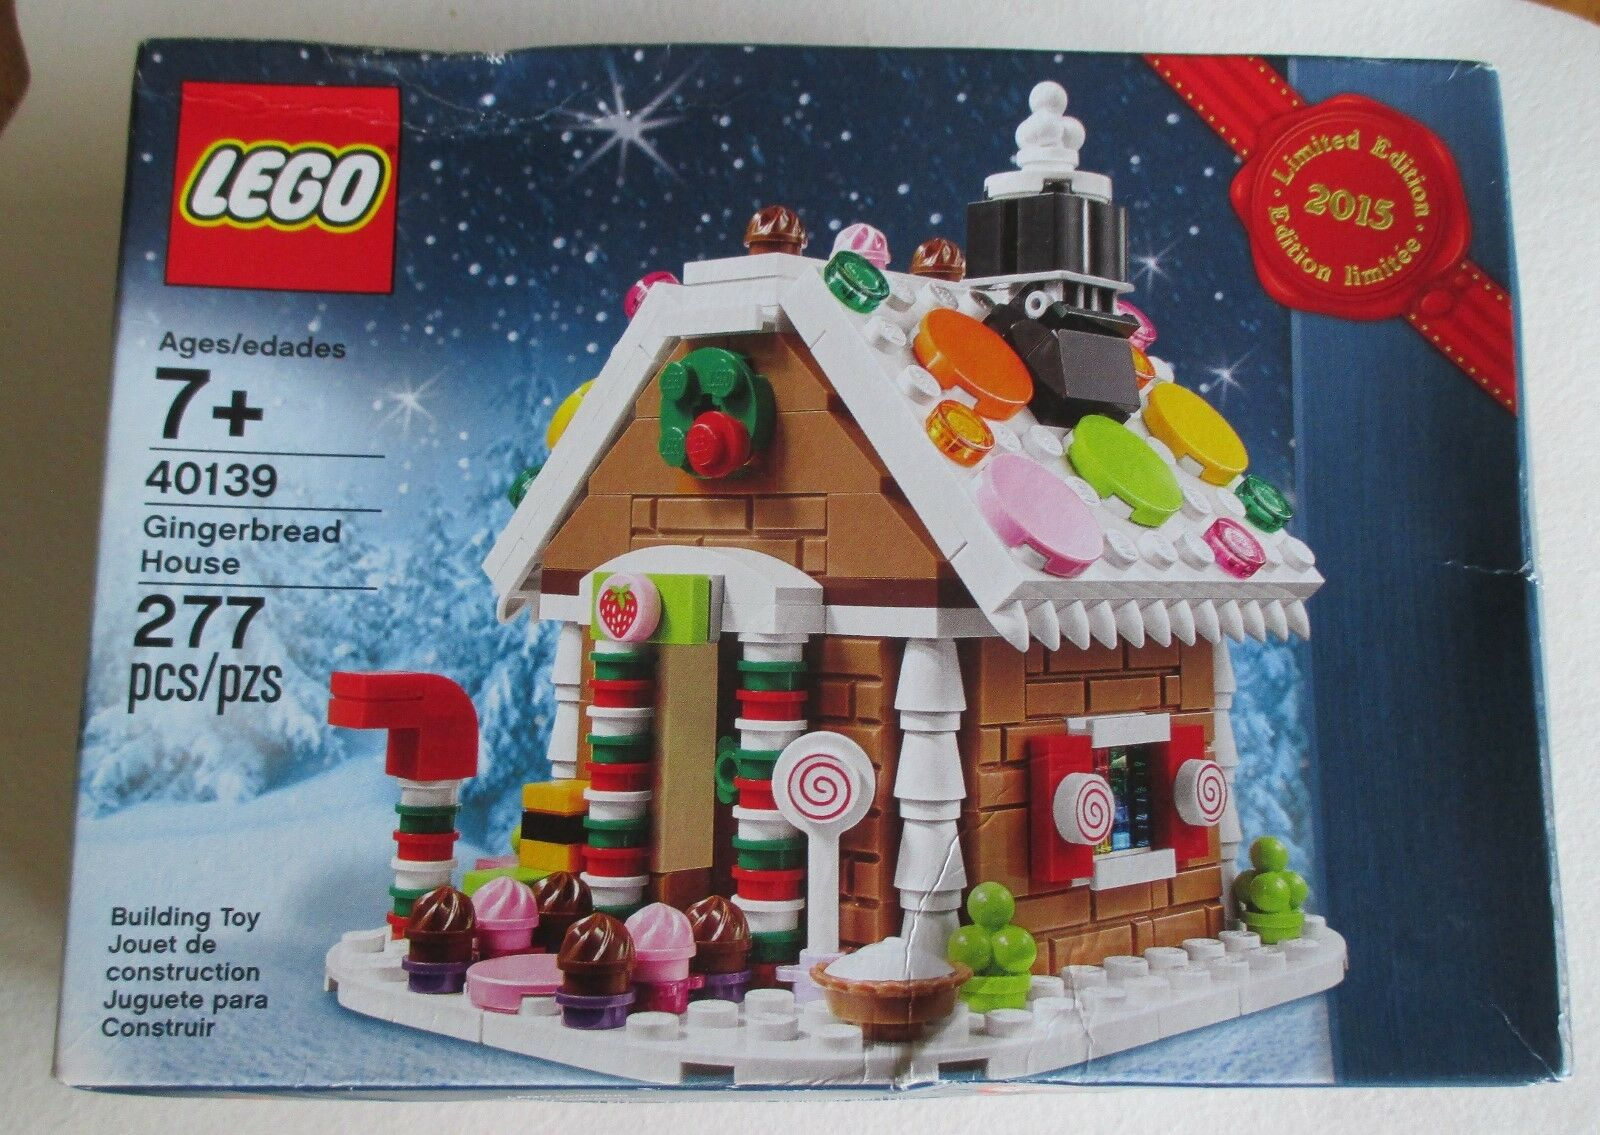 LEGO 2015 GINGERBREAD HOUSE #40139. LIMITED EDITION. 277 PIECES. NIB (4696)